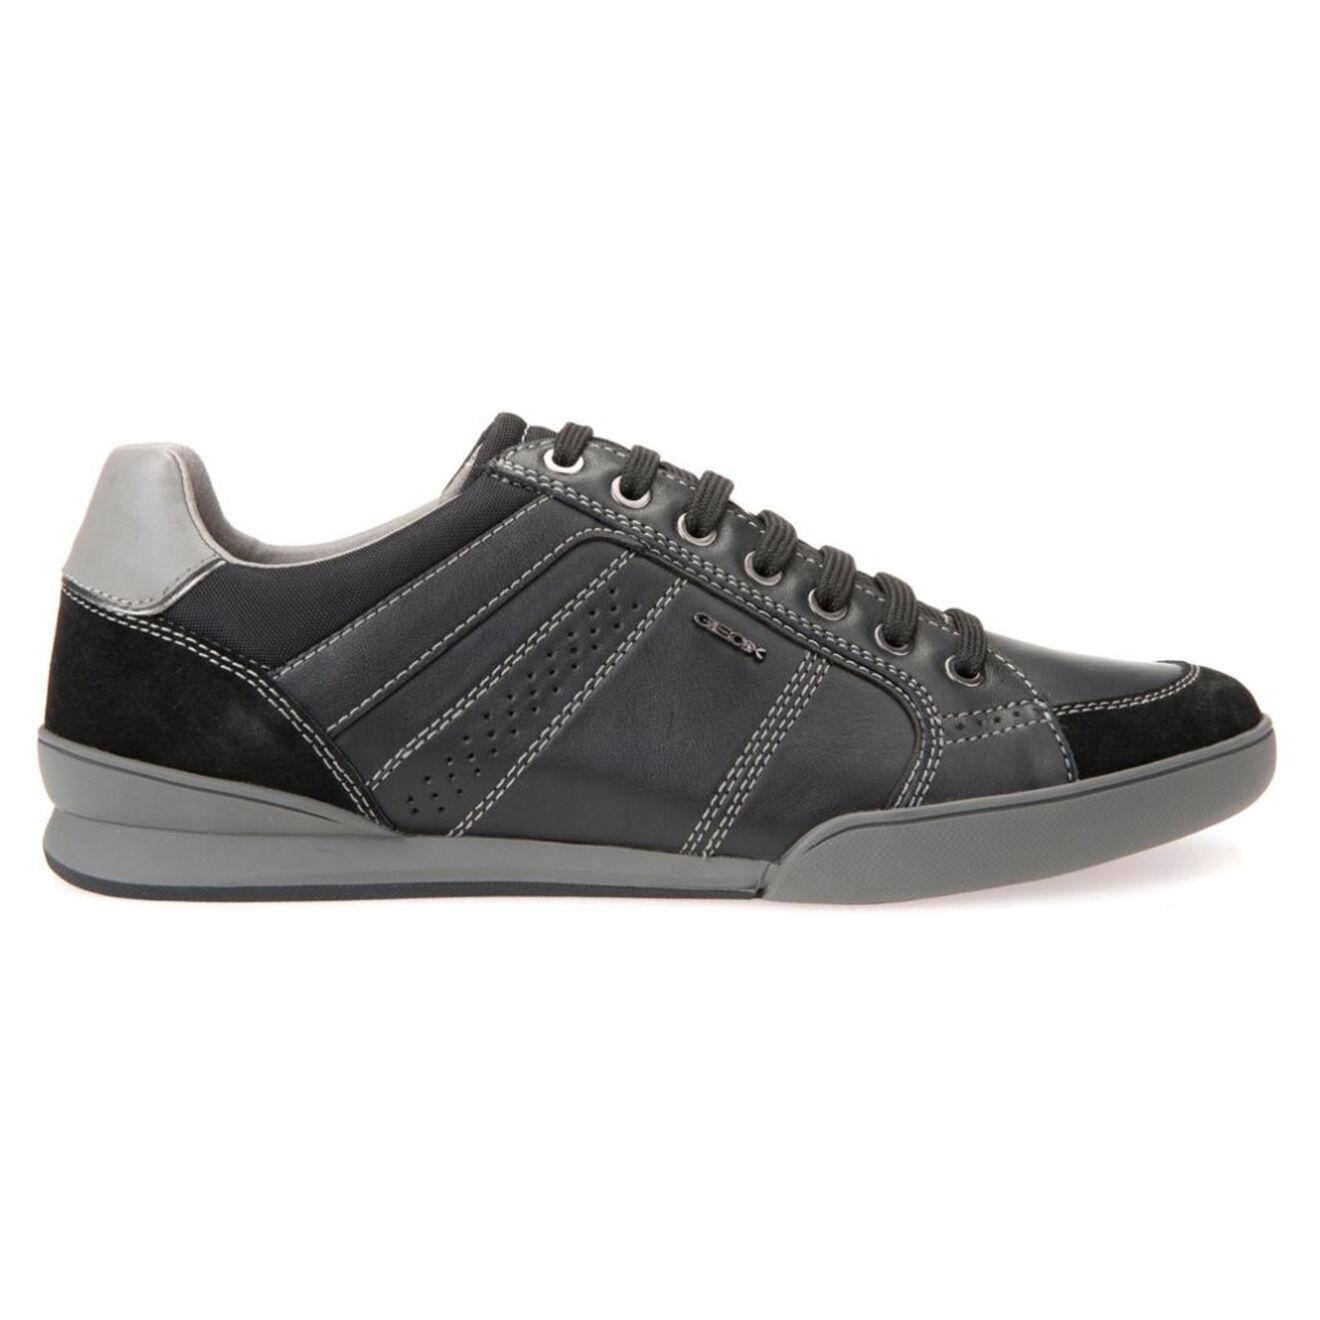 Baskets en Cuir & Velours de Cuir noir/gris - Geox - Modalova